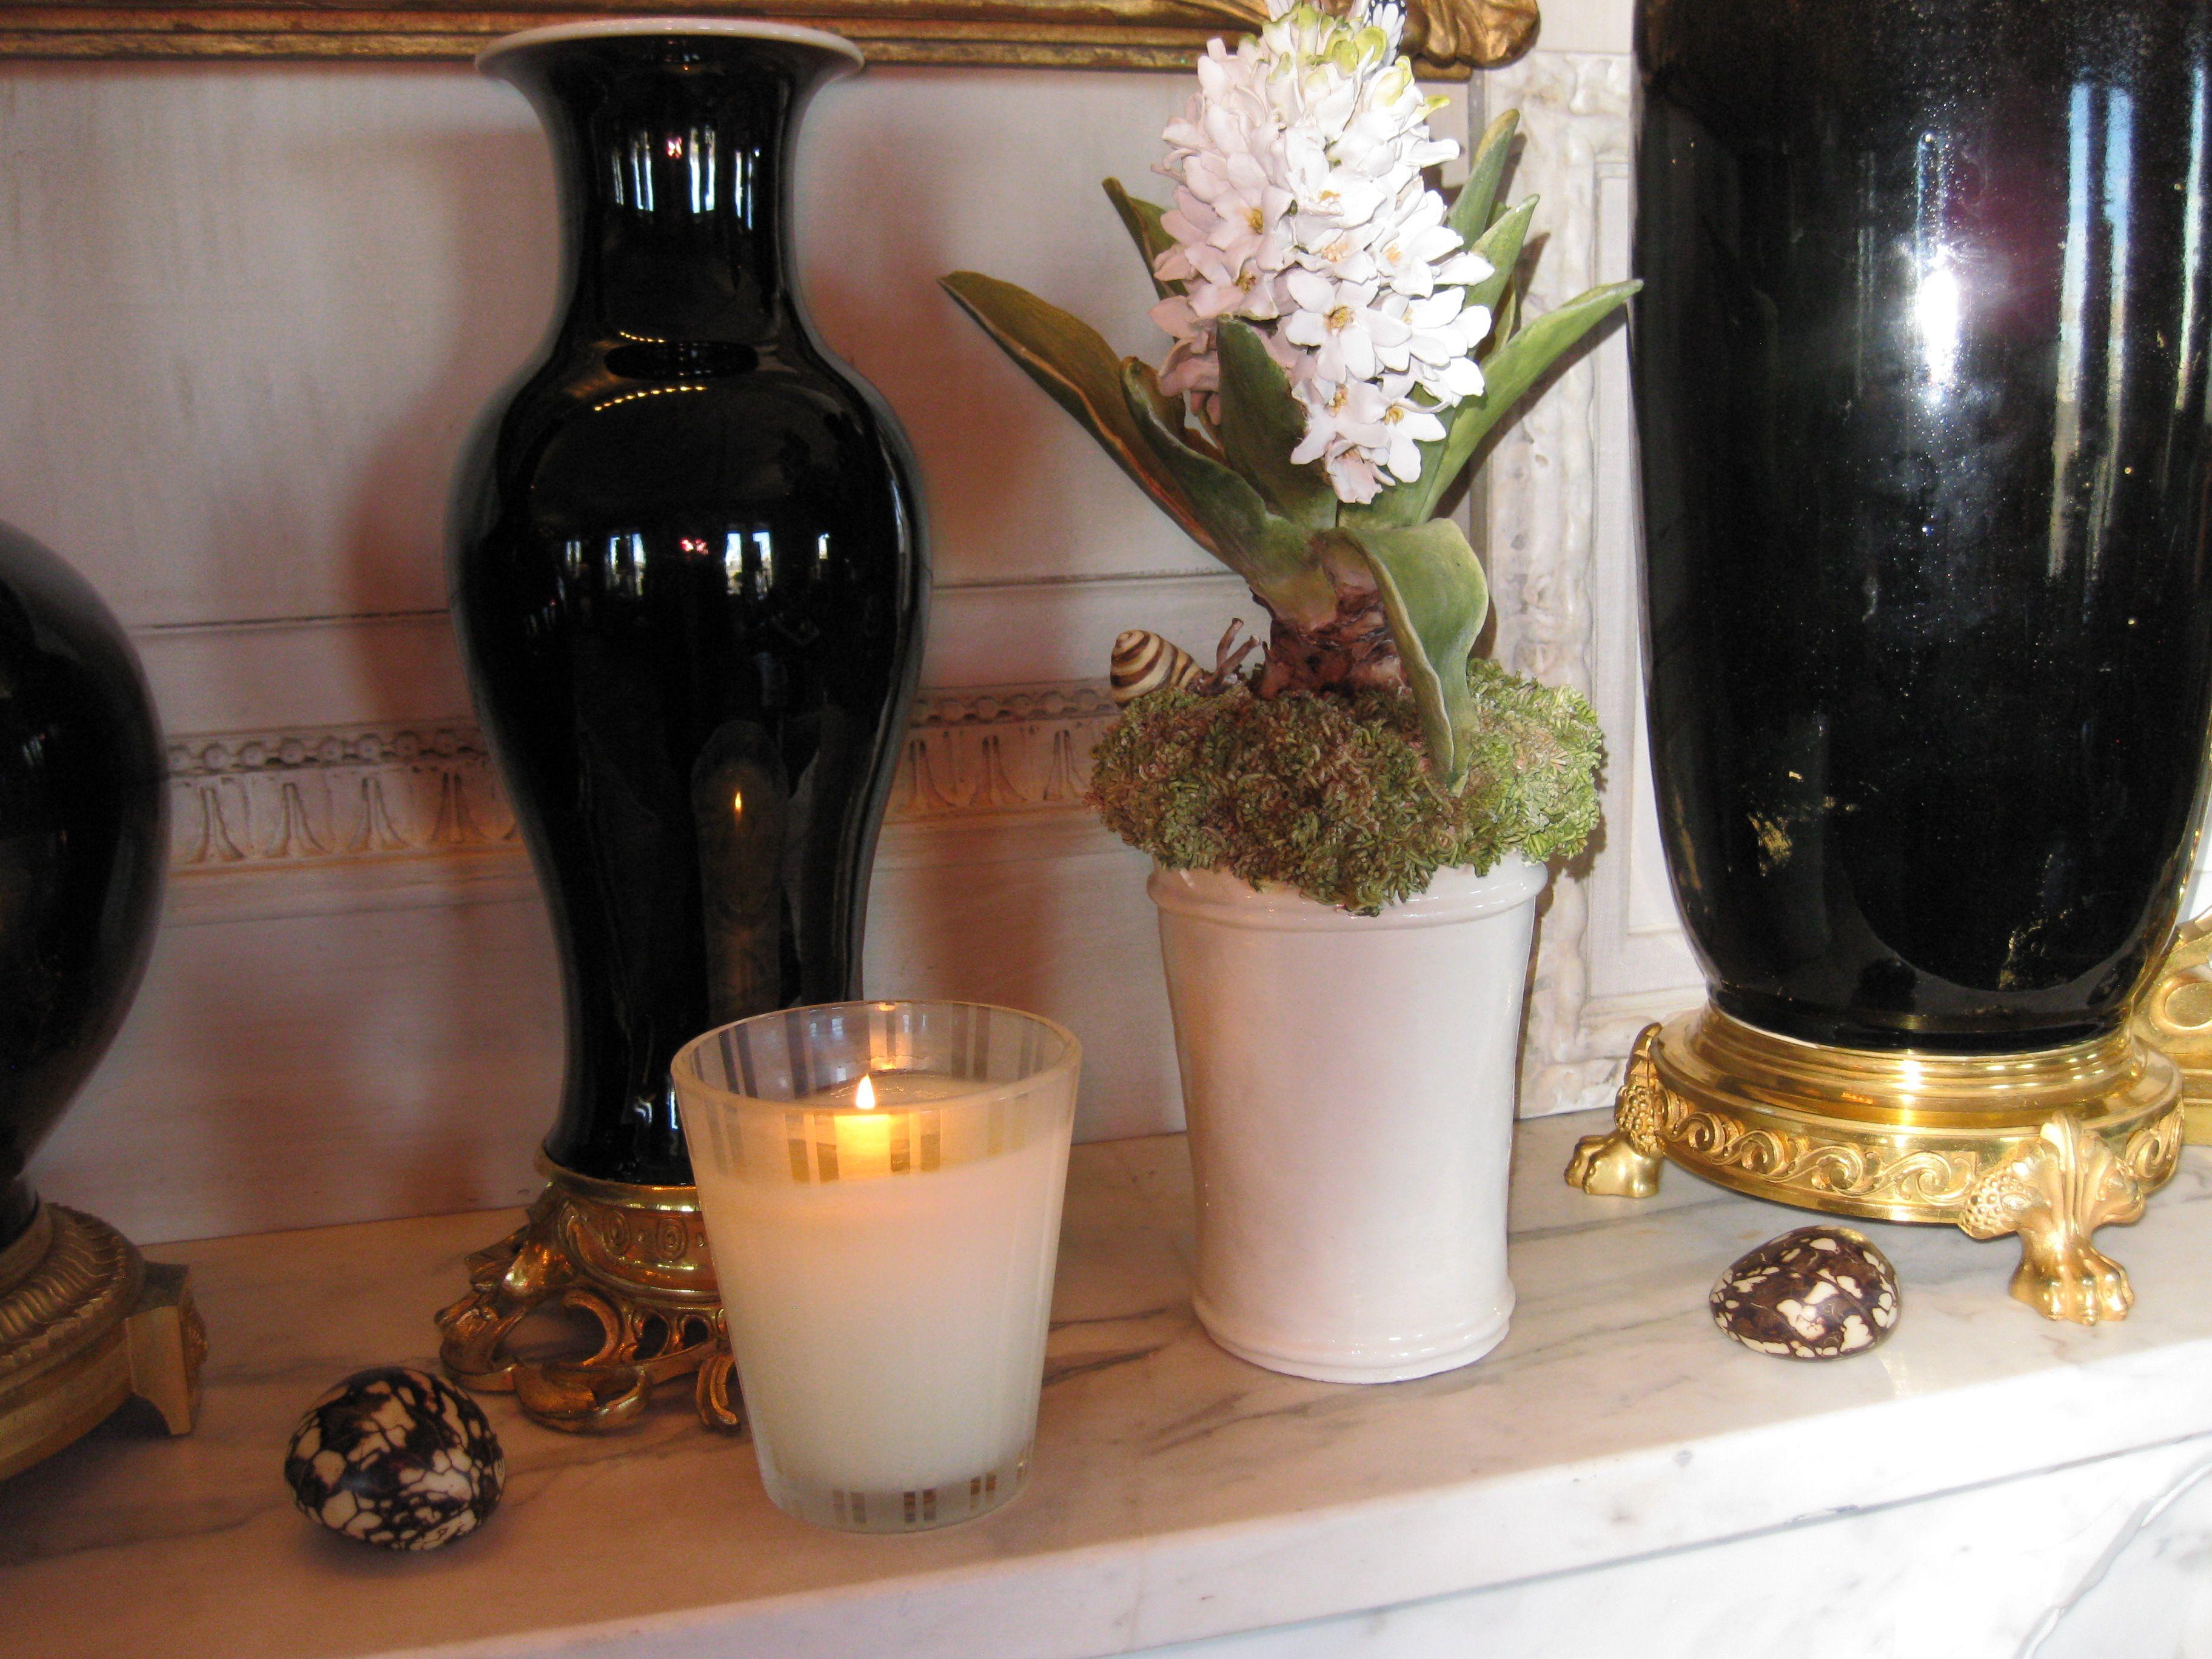 Hyacinth By Ceramic Artist Clare Potter In New York Living Room Of Interior Designer Howard Slatkin